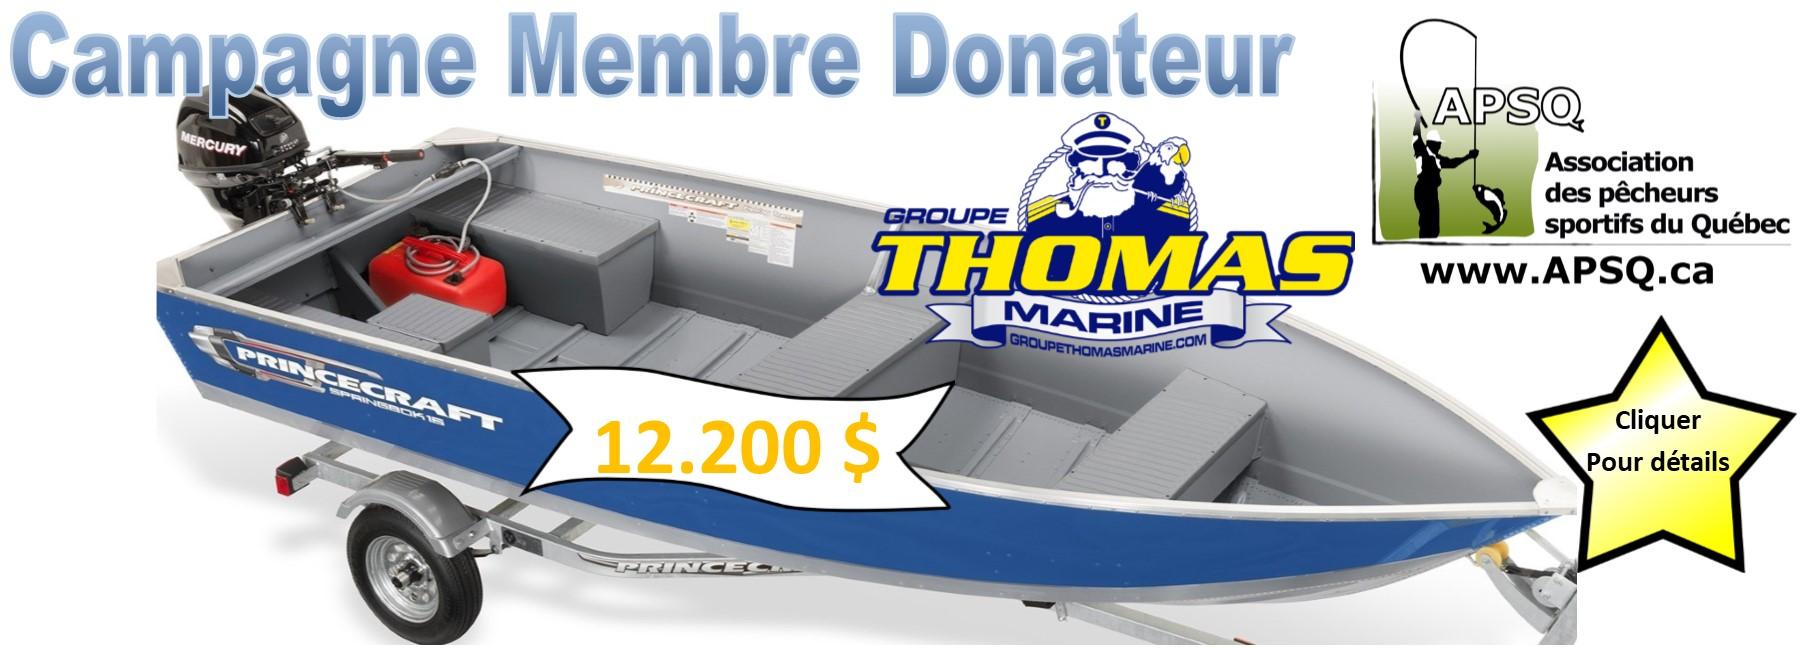 Campagne Donateur